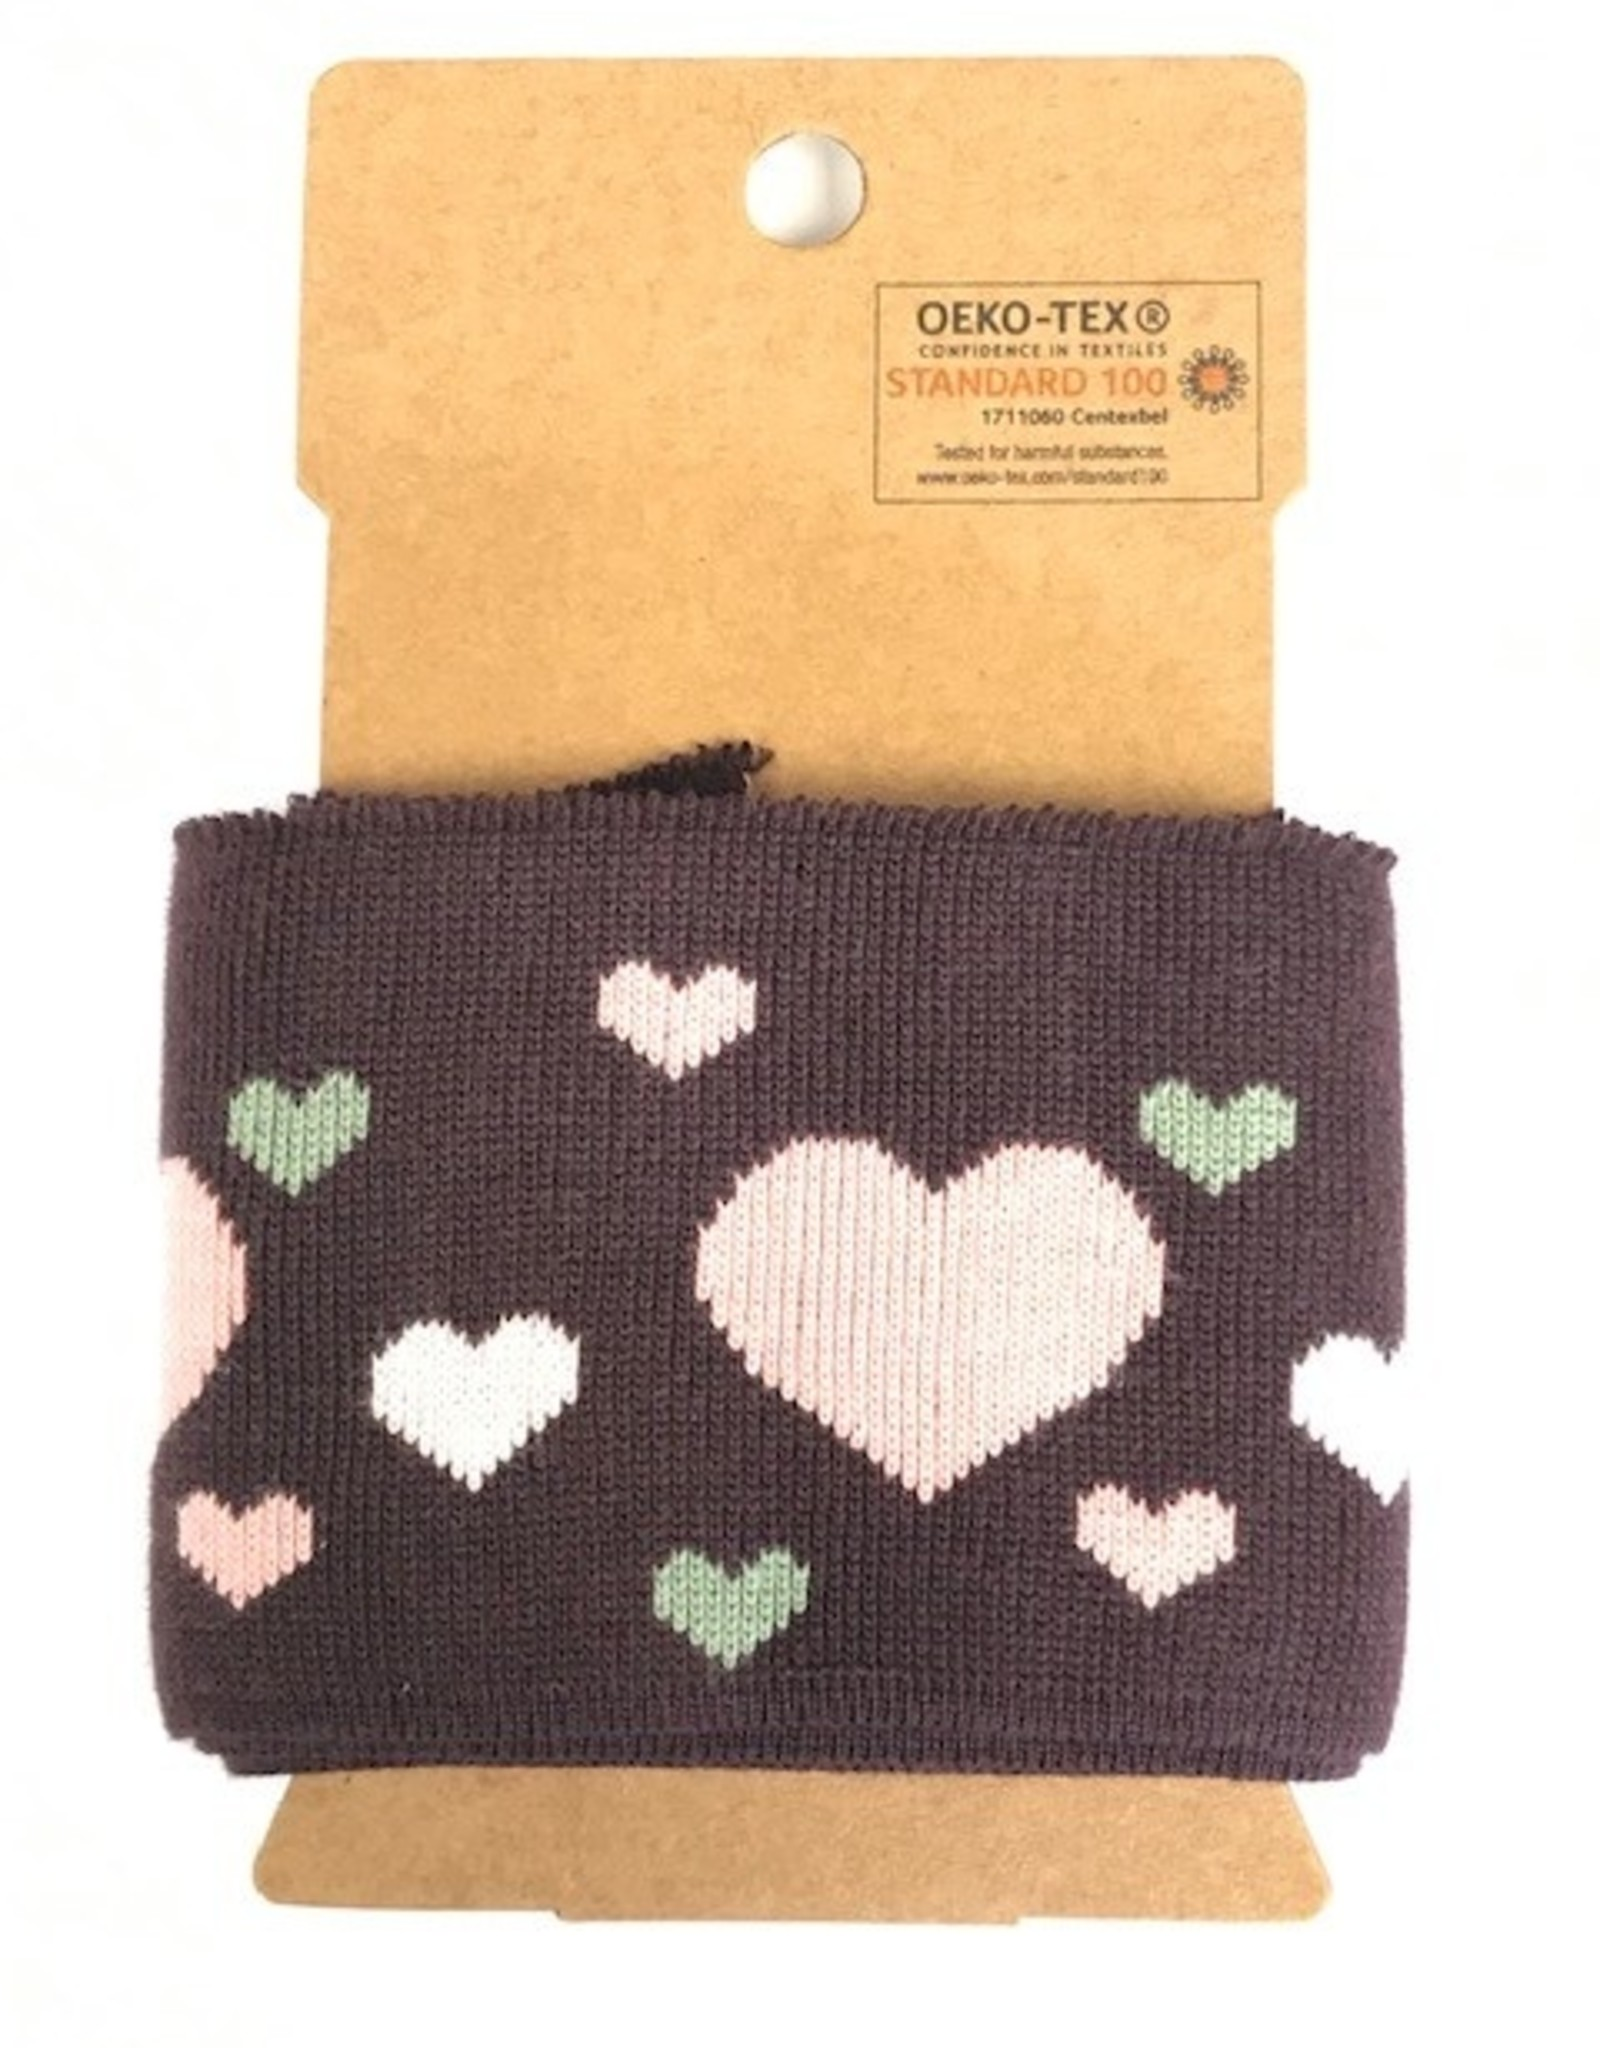 Cuffs harts bordeaux-rose-groen 110*7cm